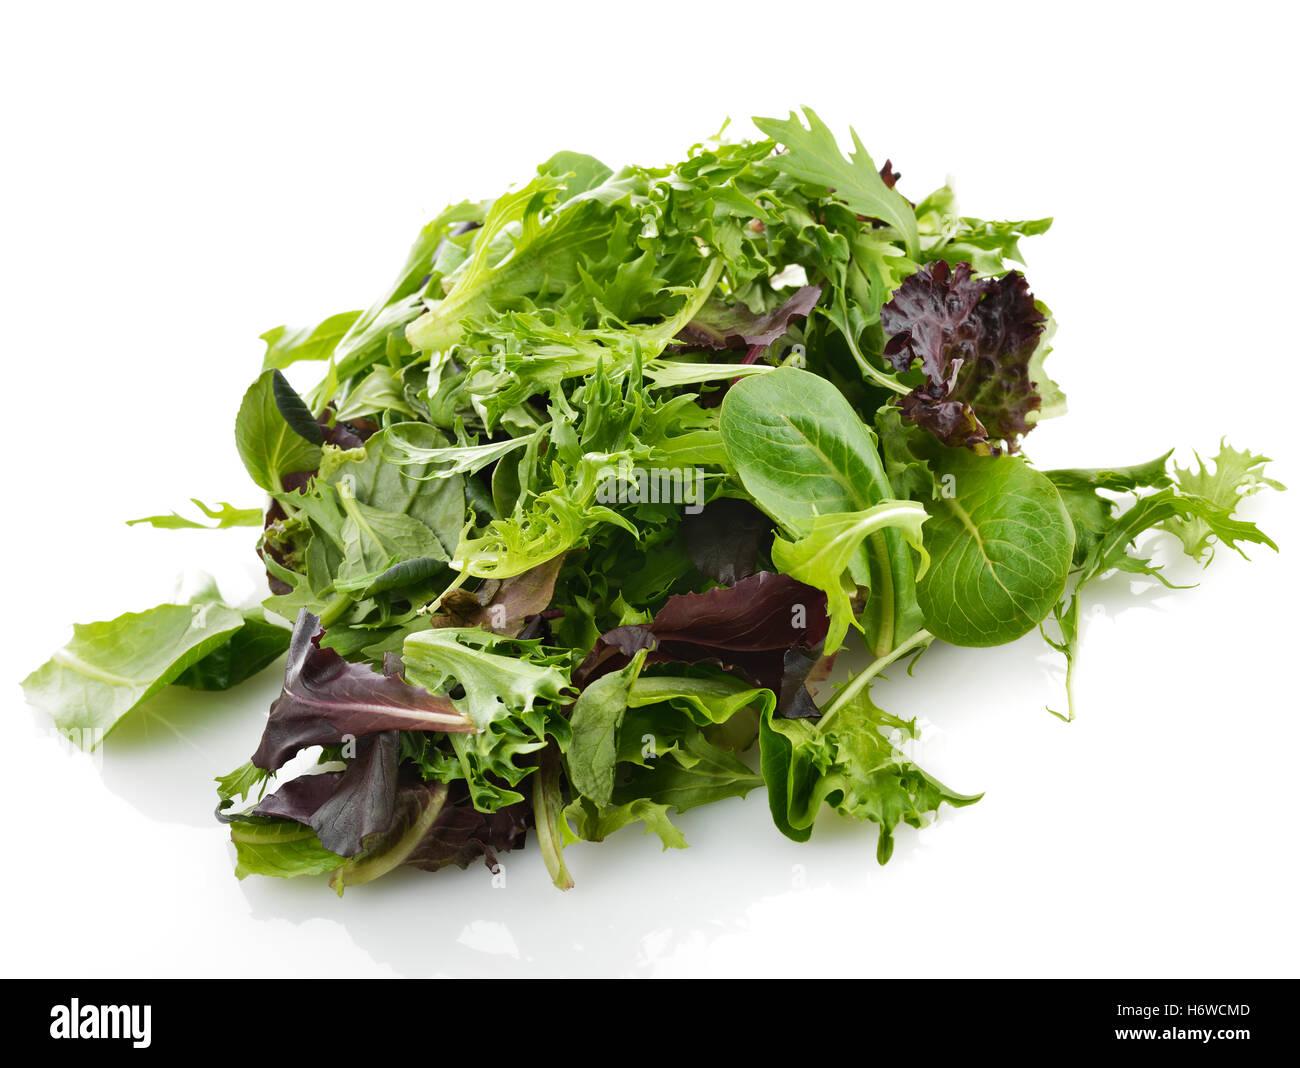 spring bouncing bounces hop skipping frisks jumping jump vegetable vegetarian spinach textured salad food aliment - Stock Image